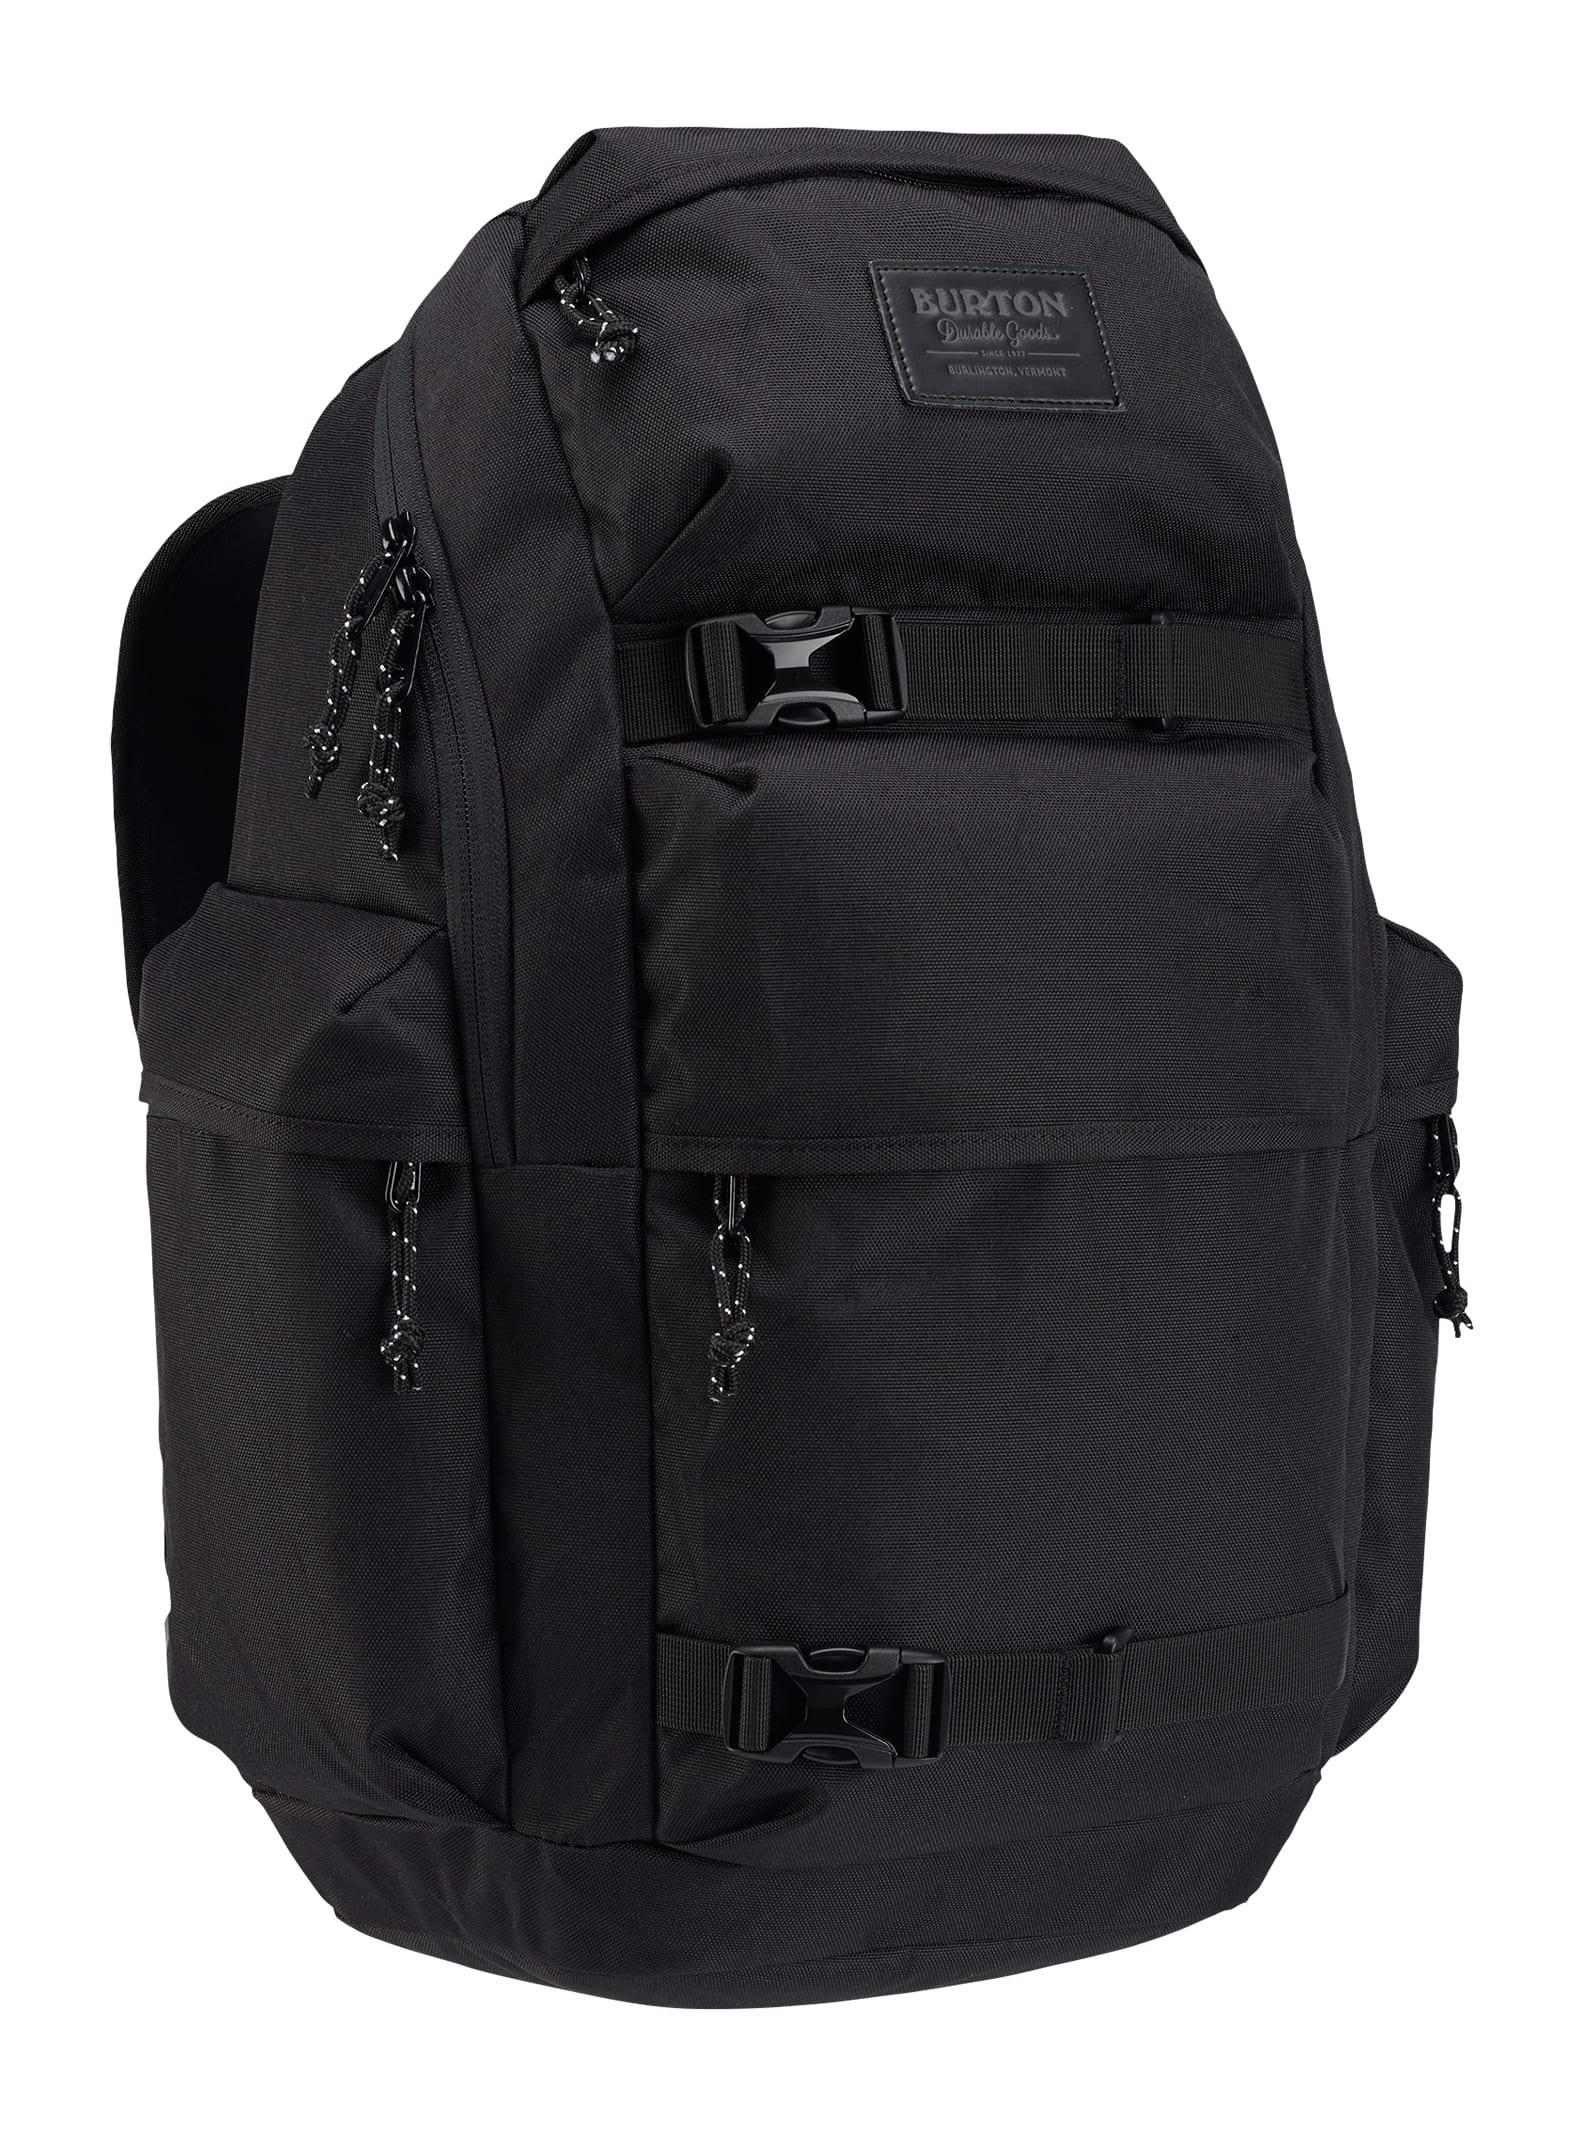 Backpacks  5c8beb16dccb1